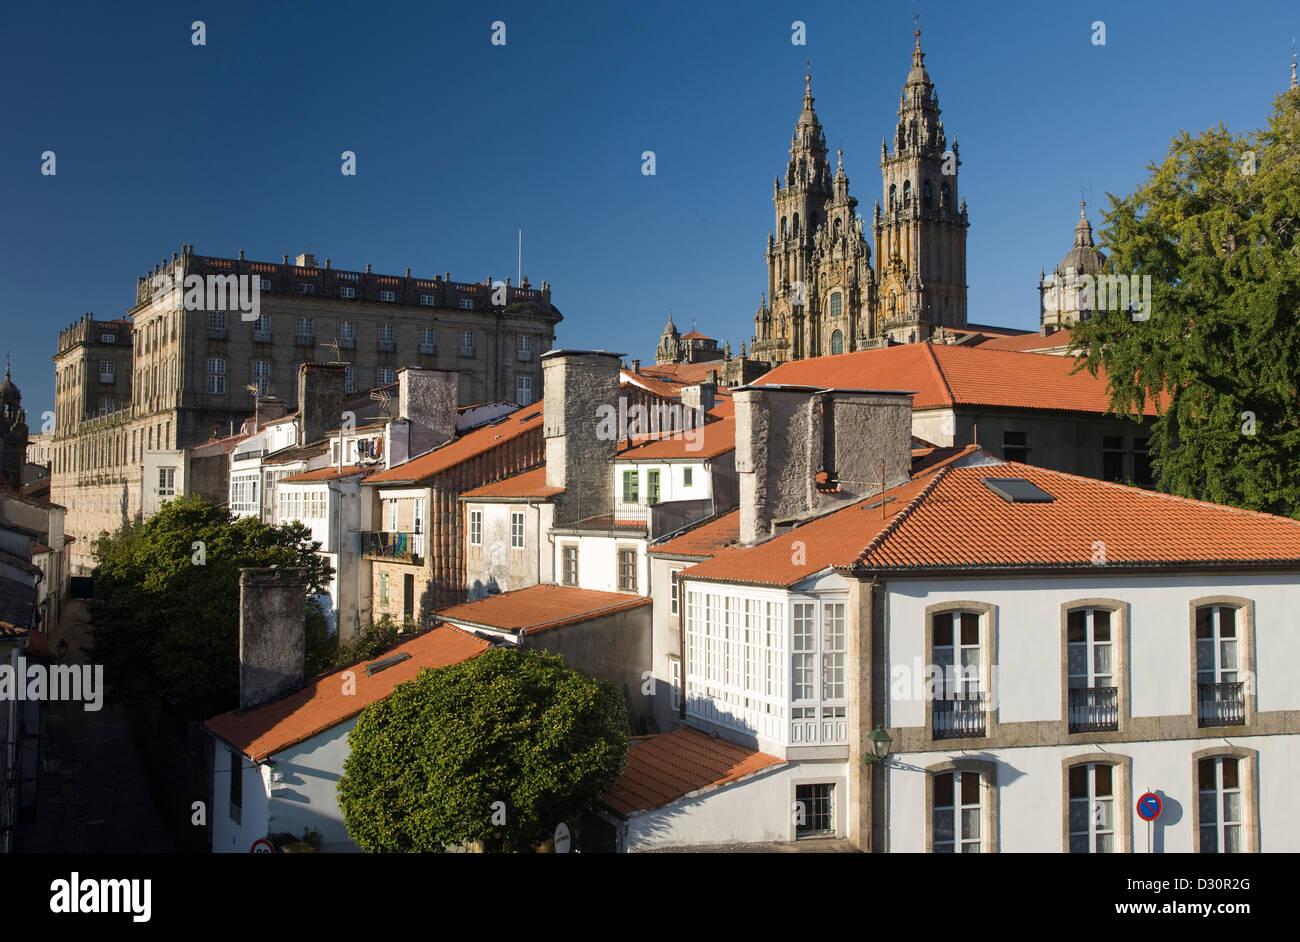 CATHEDRAL OF SAINT JAMES OLD CITY SANTIAGO DE COMPOSTELA GALICIA SPAIN Stock Photo